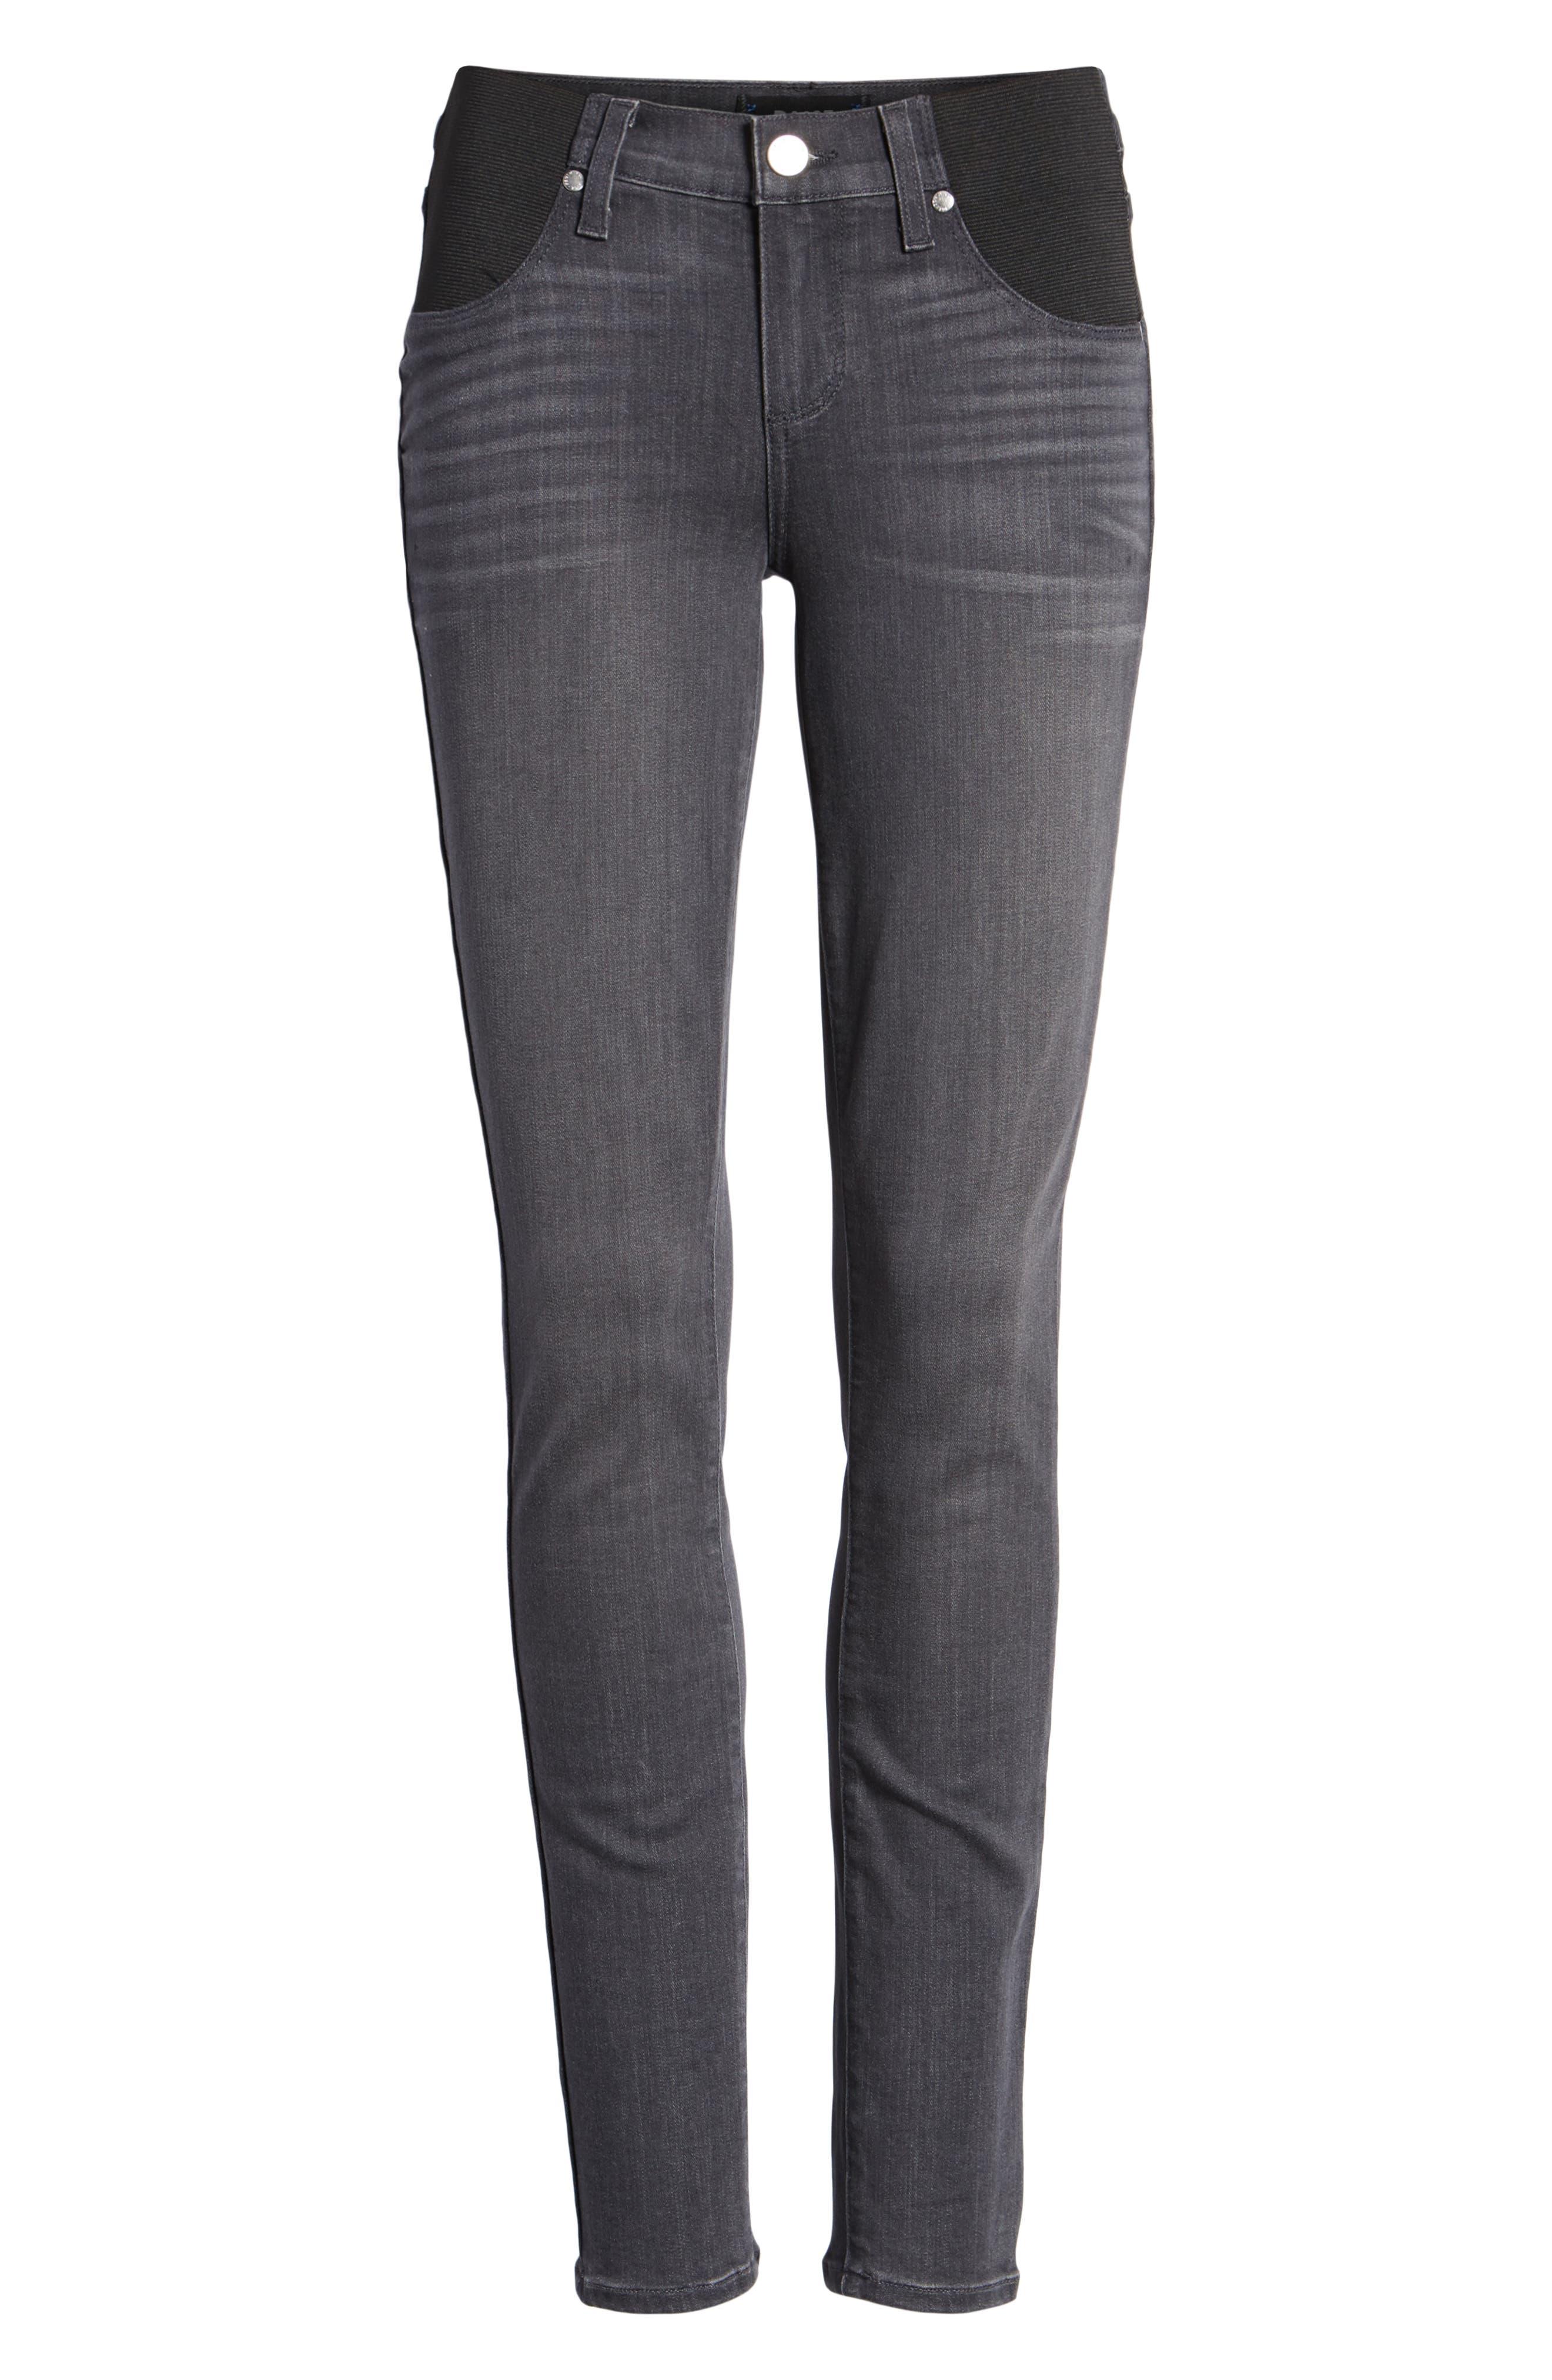 Transcend - Verdugo Maternity Skinny Jeans,                             Alternate thumbnail 7, color,                             GREY PEAKS